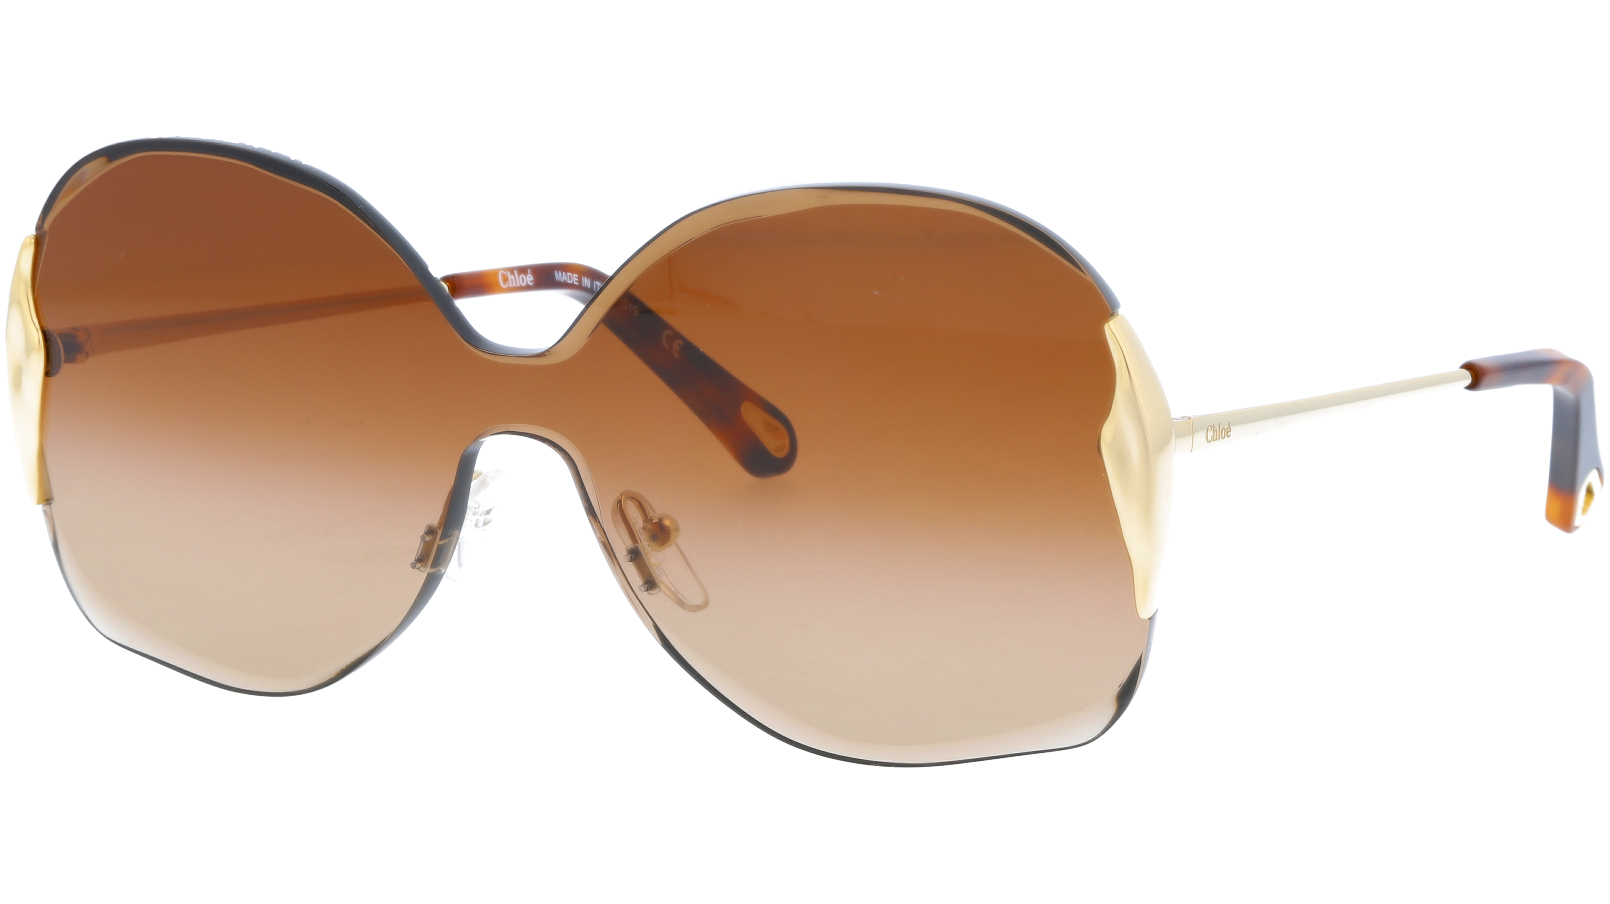 CHLOE CE162S 742 59 Gold Single Lens Sunglasses